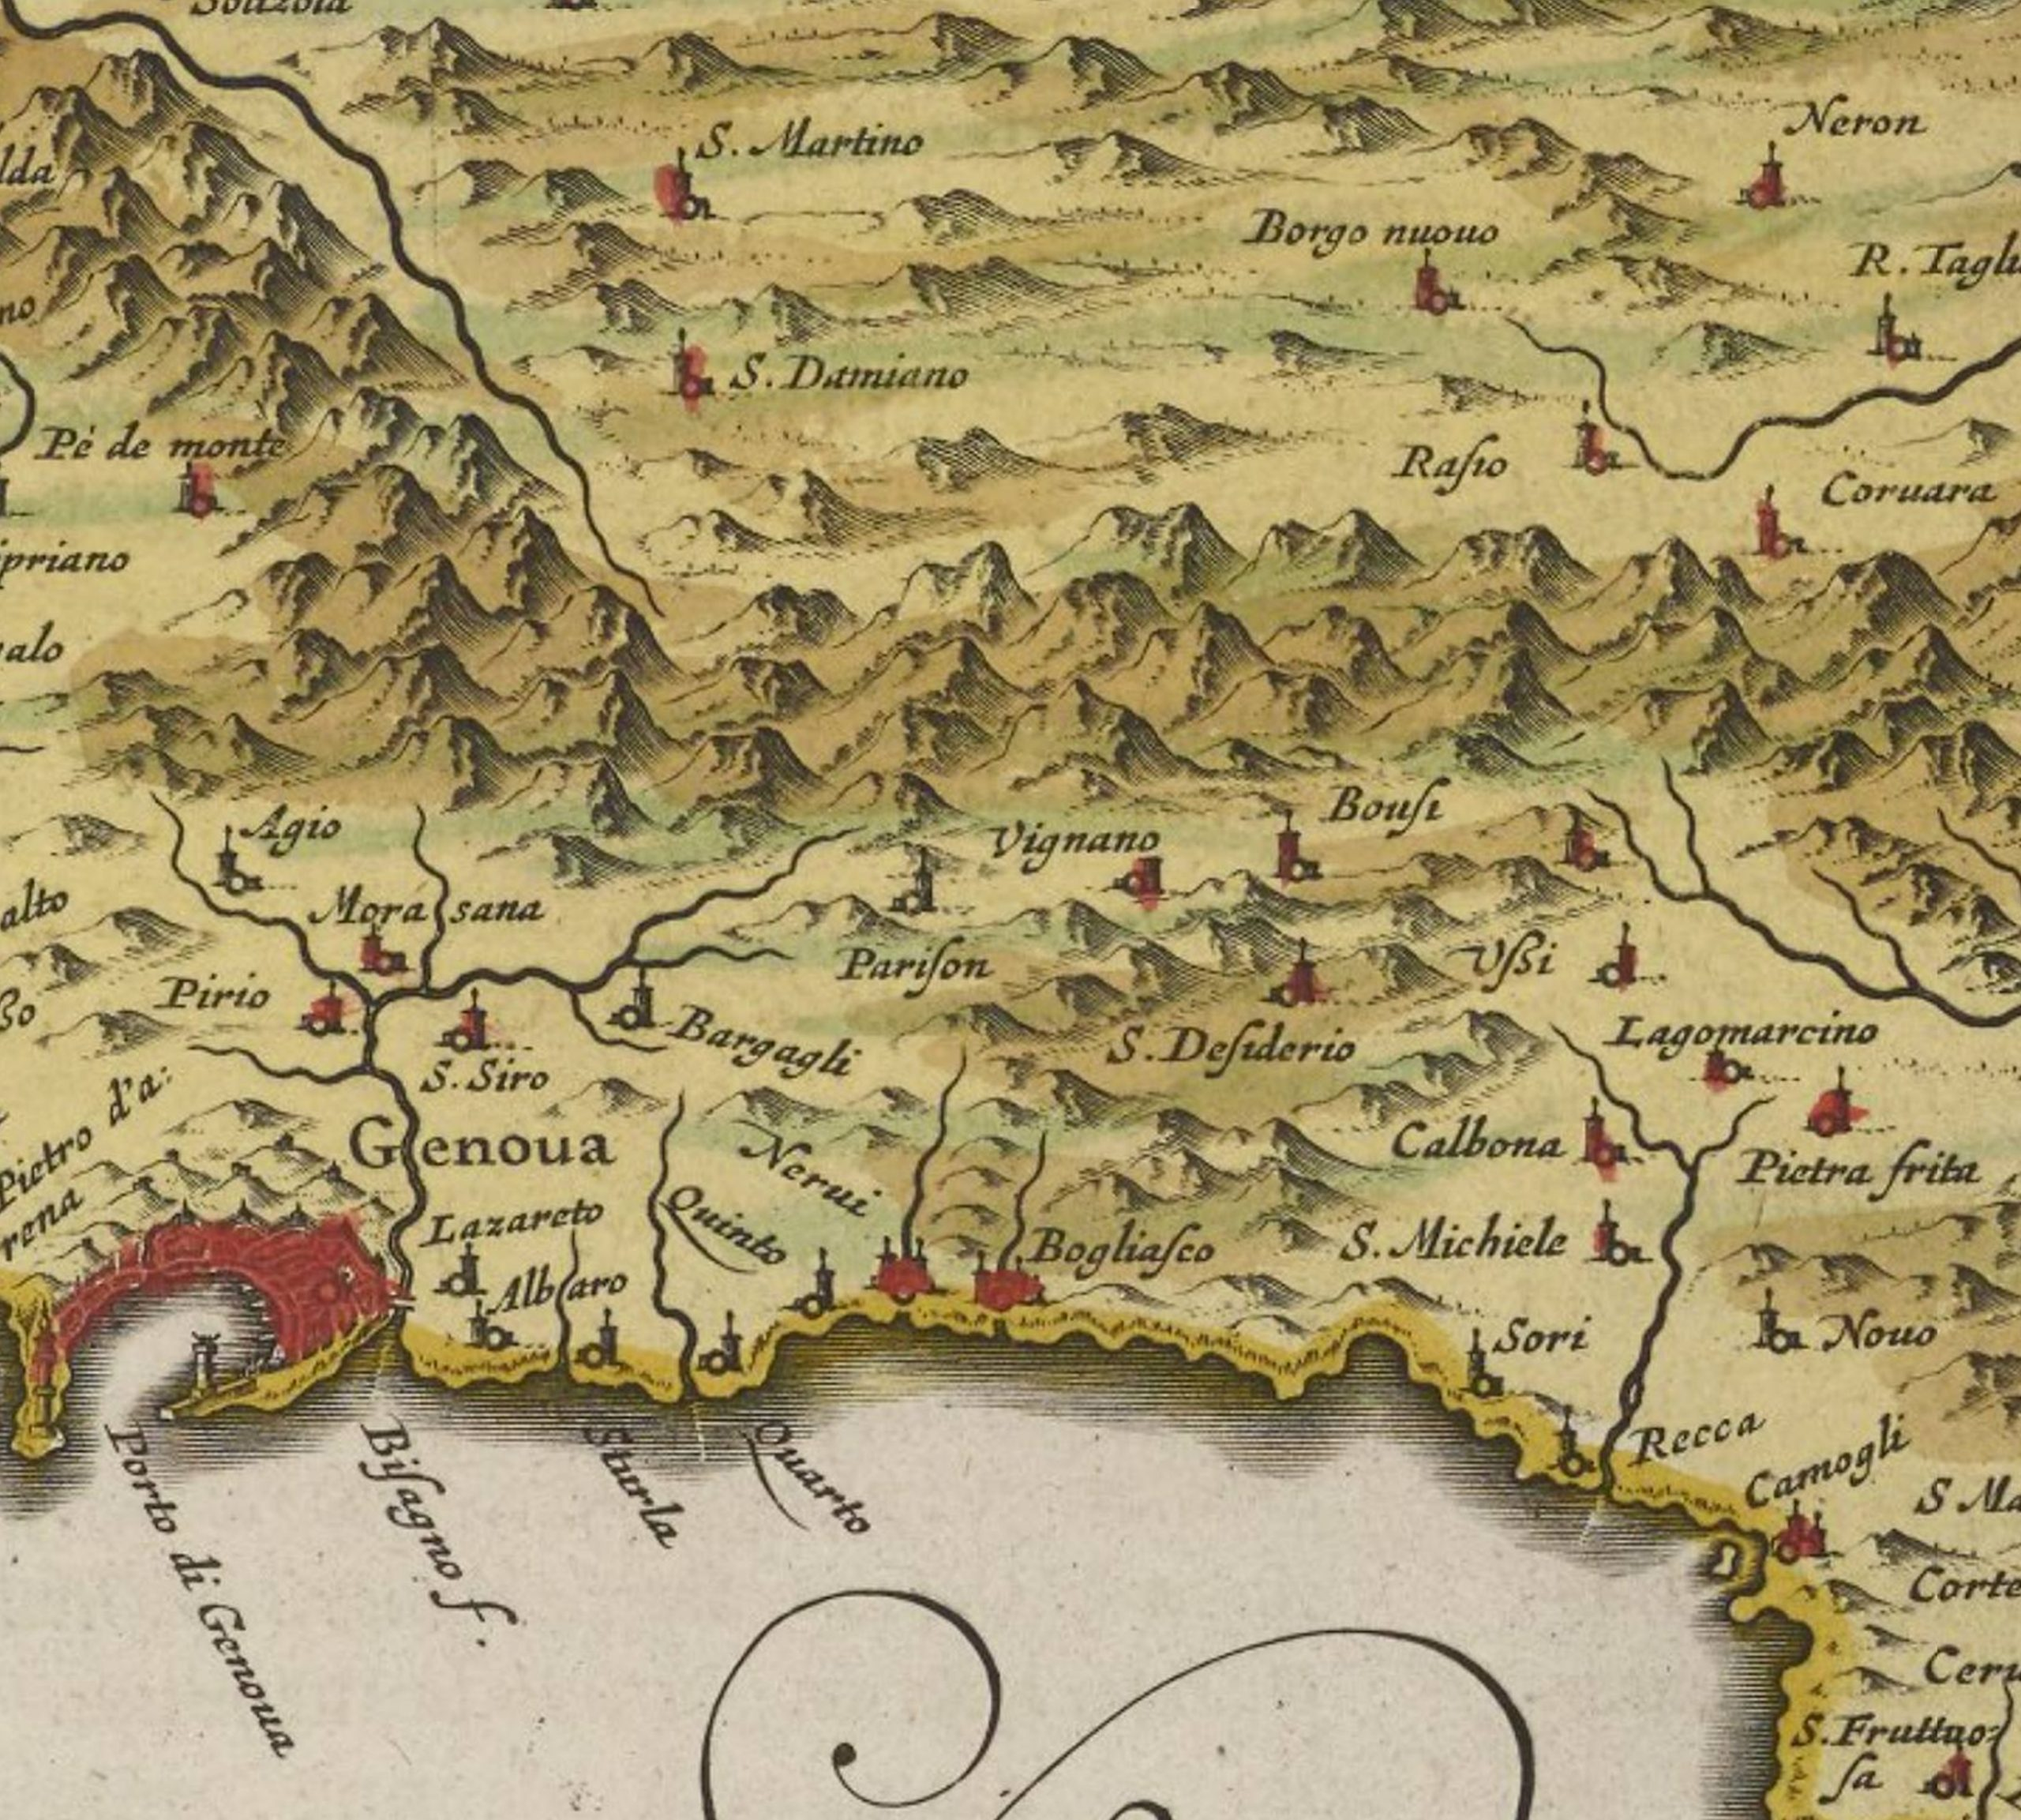 Mapa hecho por un ingeniero cartógrafo